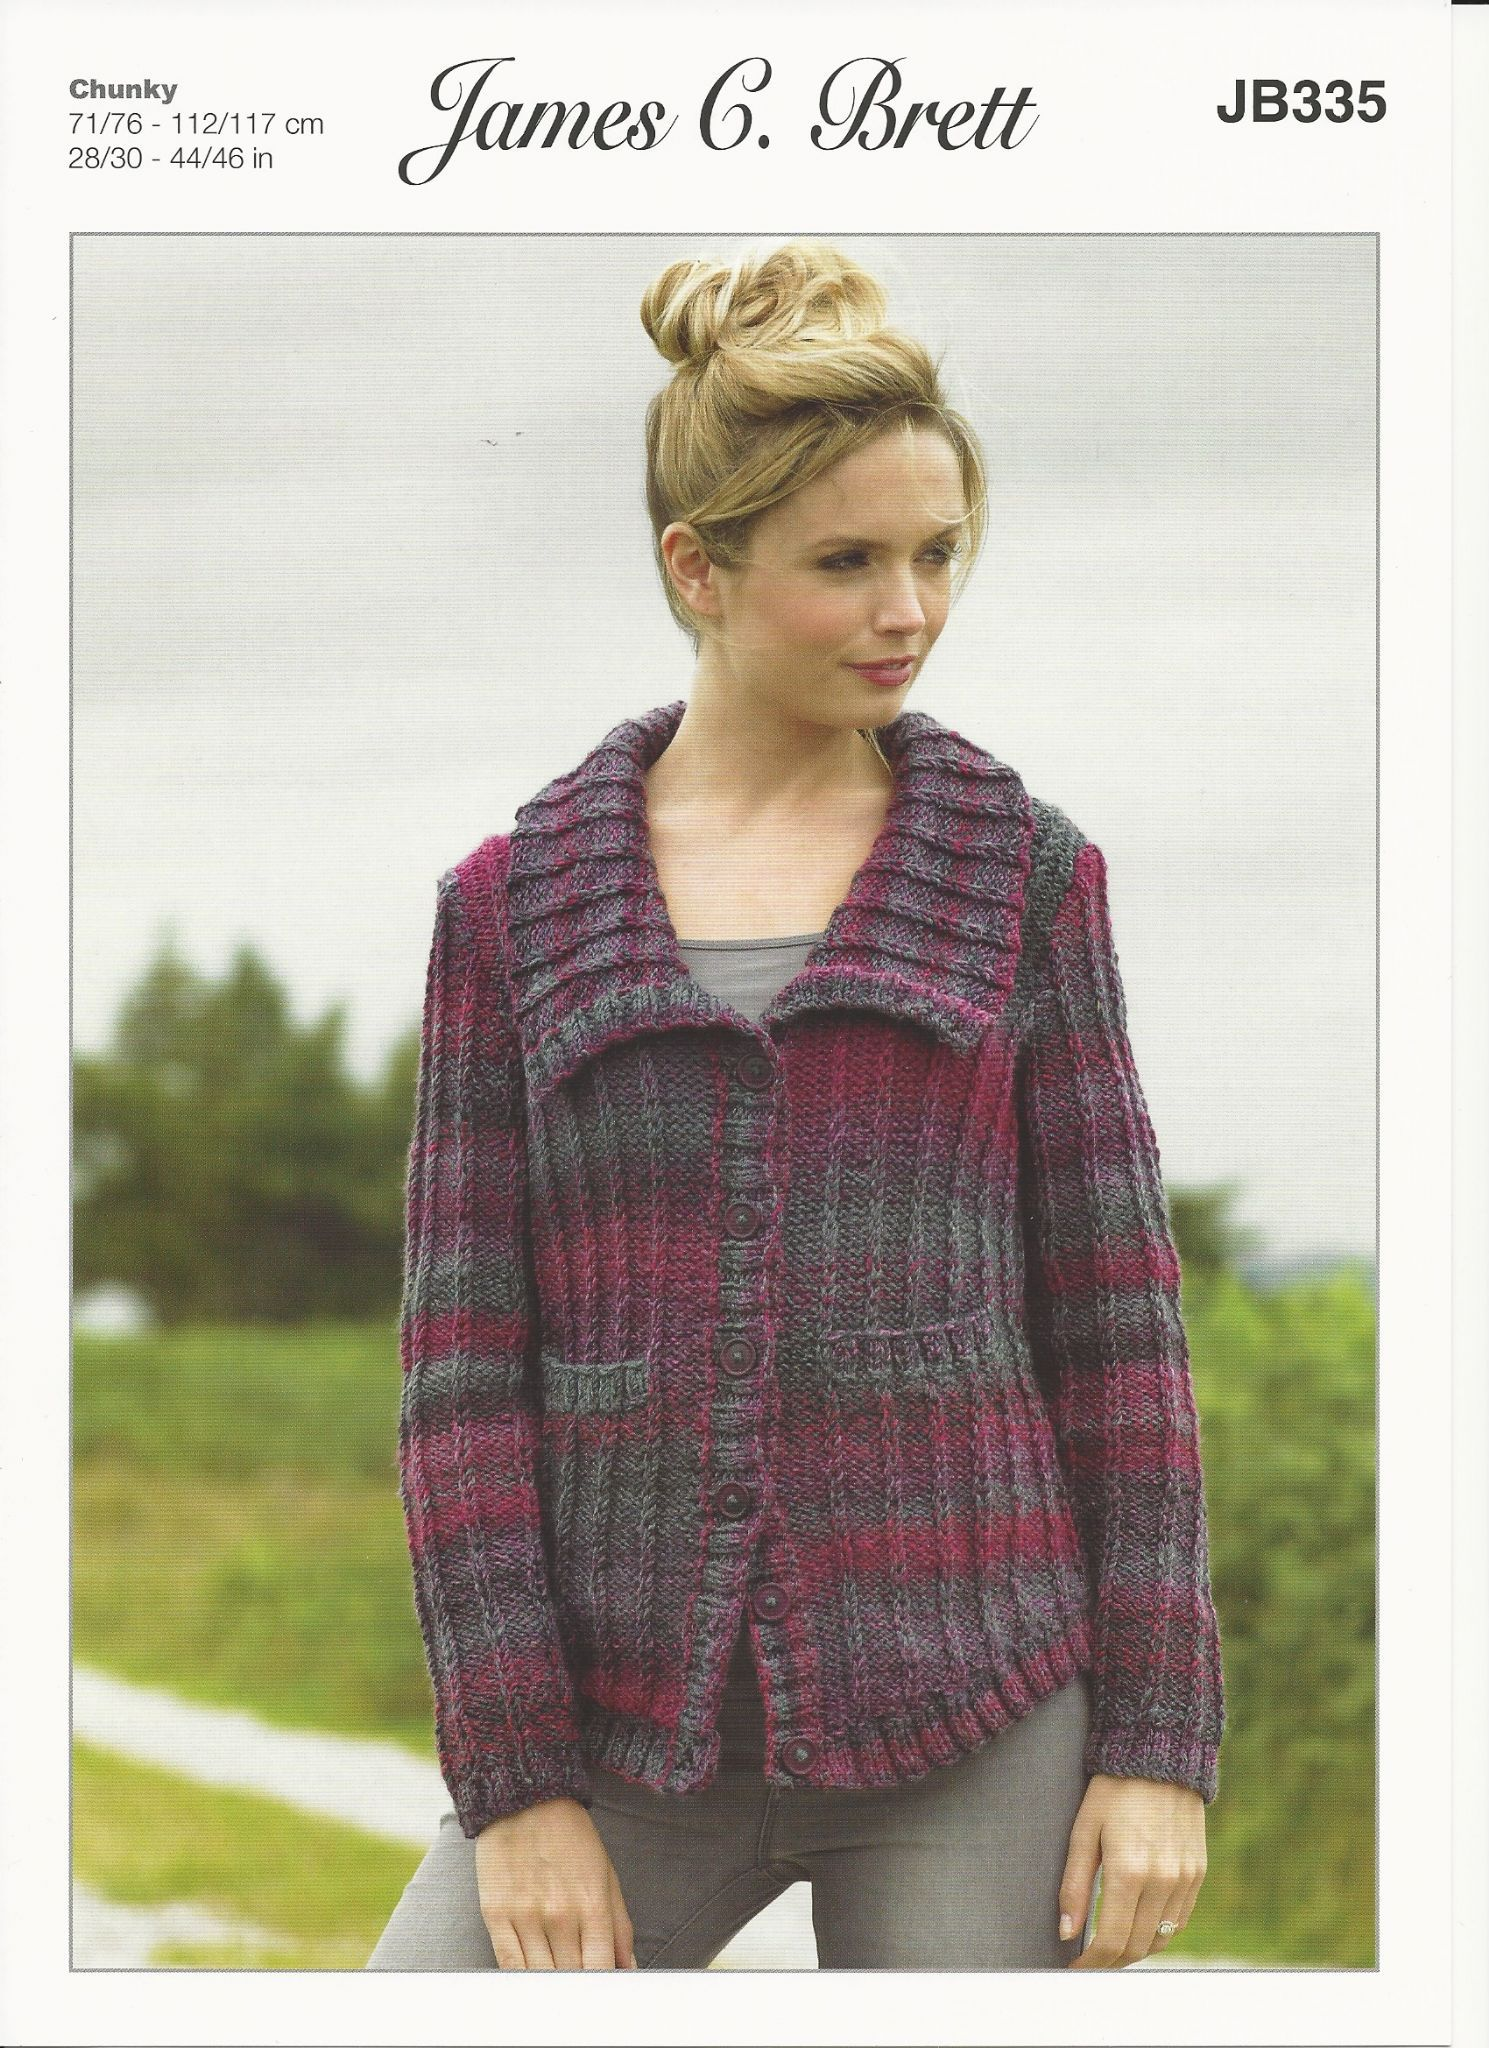 a98668d3948c James C Brett JB335 uses Lakeland Chunky yarn. Sizes from 8-10 years ...